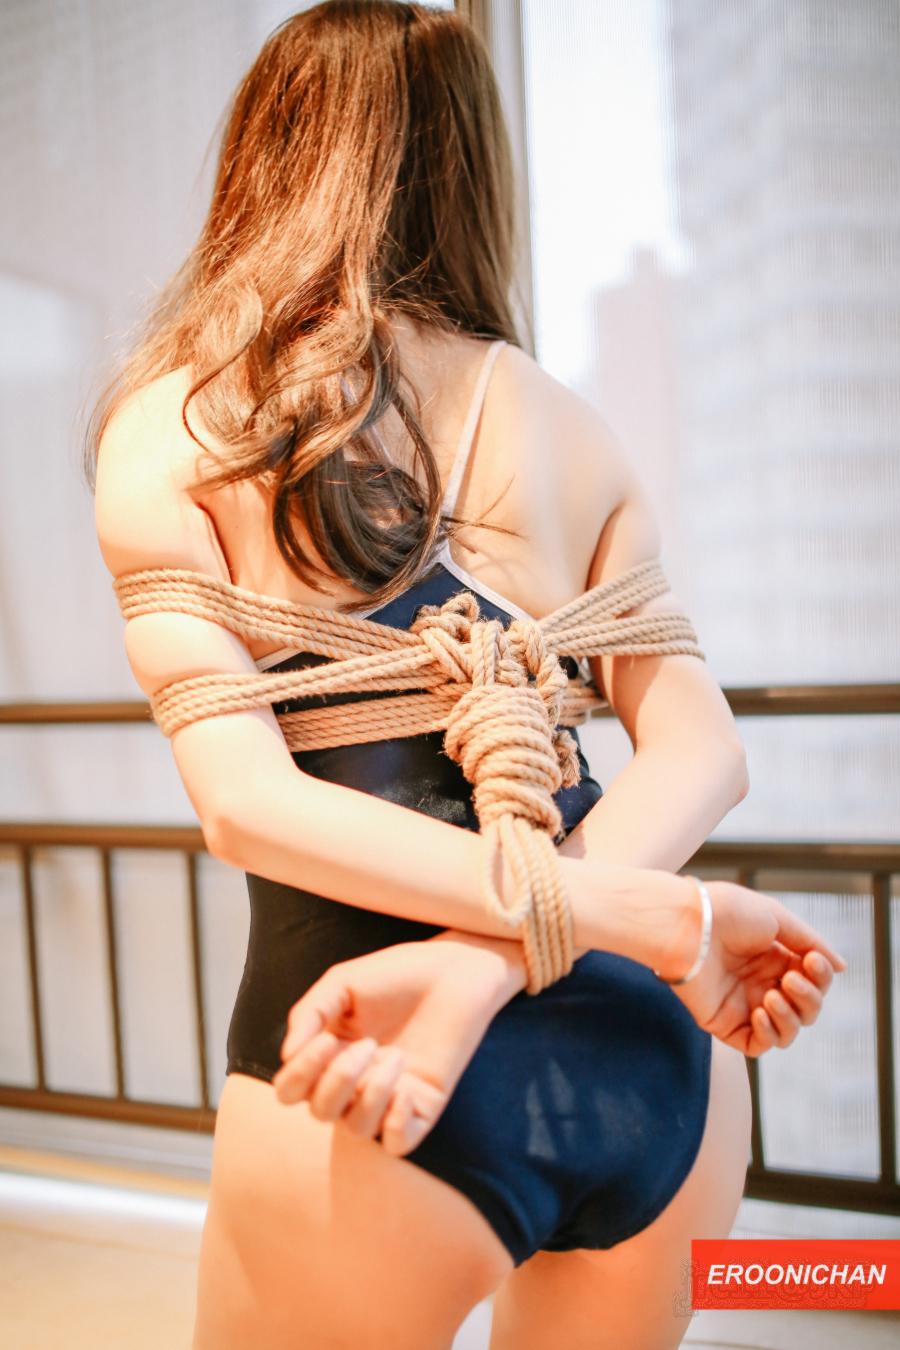 EROONICHAN攝影集-美女 夏小秋秋秋+攝影專輯之調教記錄寫真 - 貼圖 - 清涼寫真 -